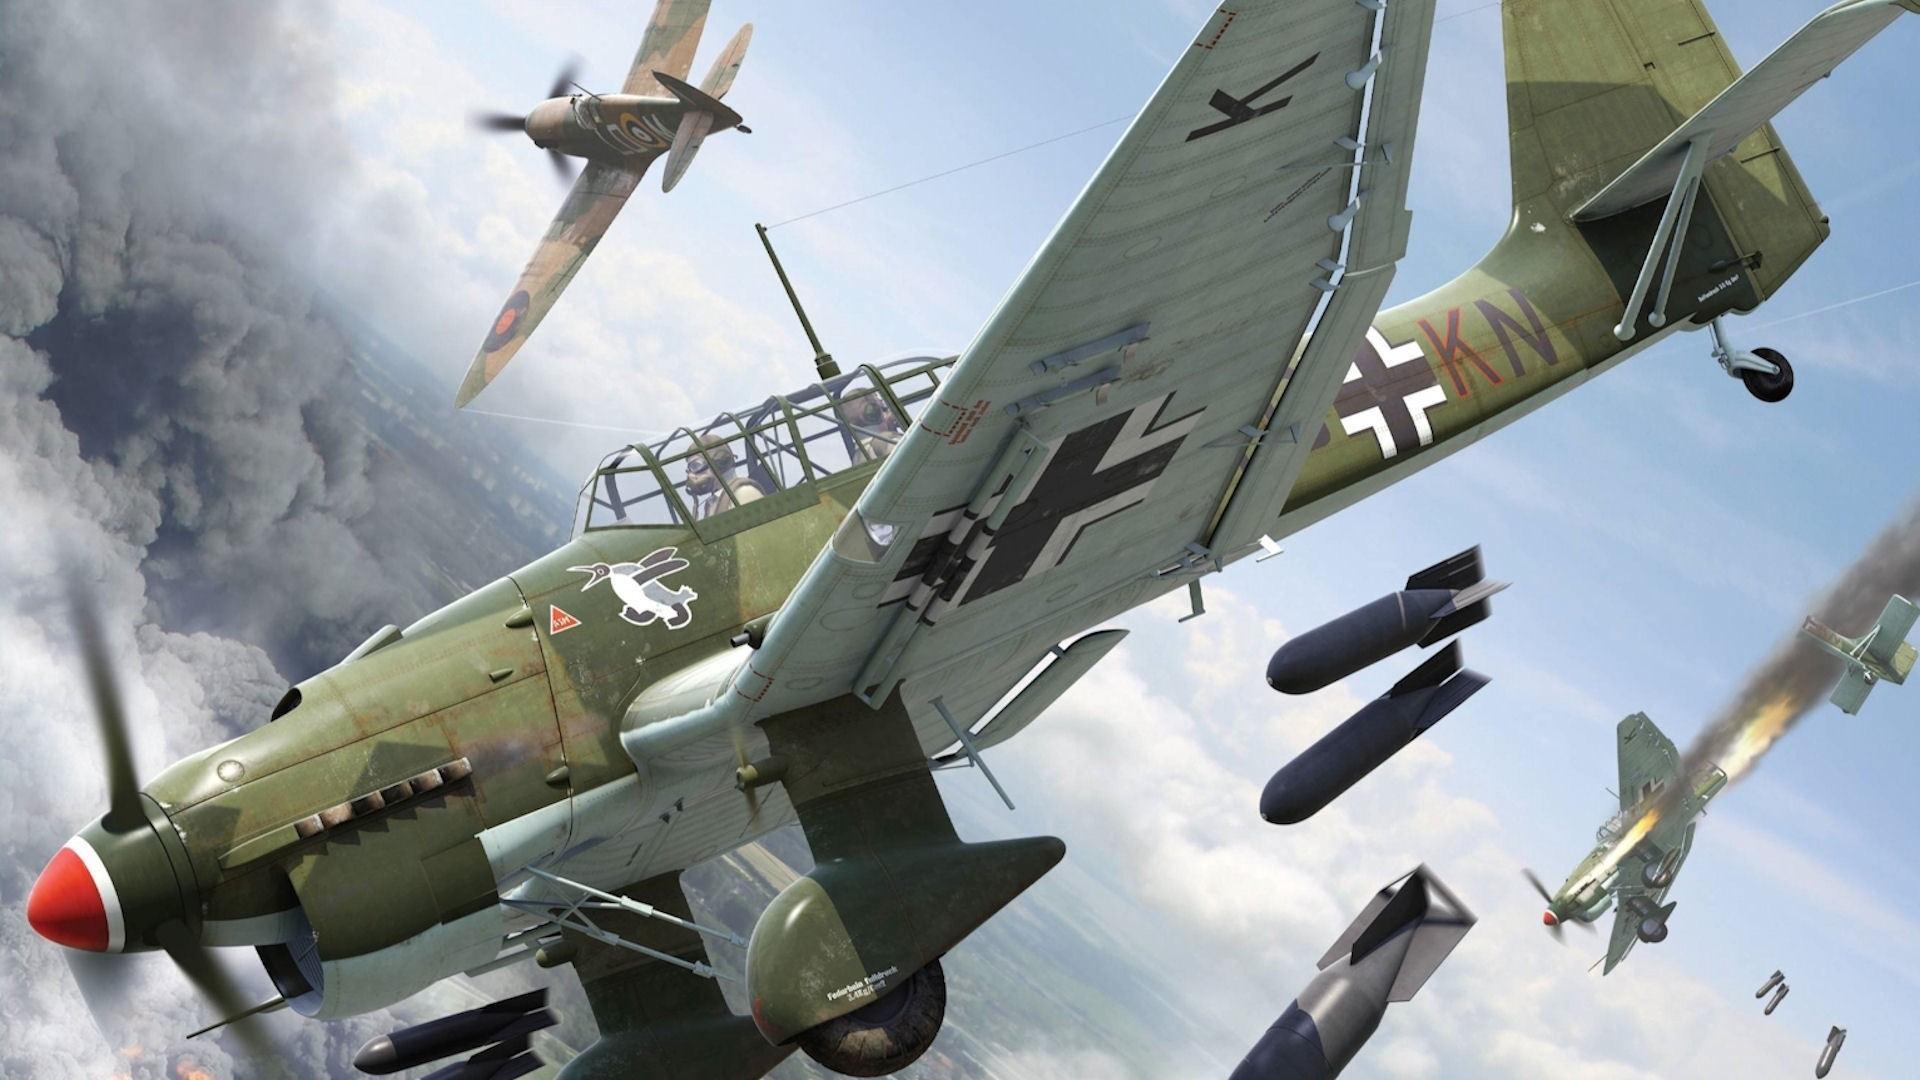 airplanes world war ii stuka supermarine spitfire jetfire junkers ju87  stuka wallpaper Art HD Wallpaper